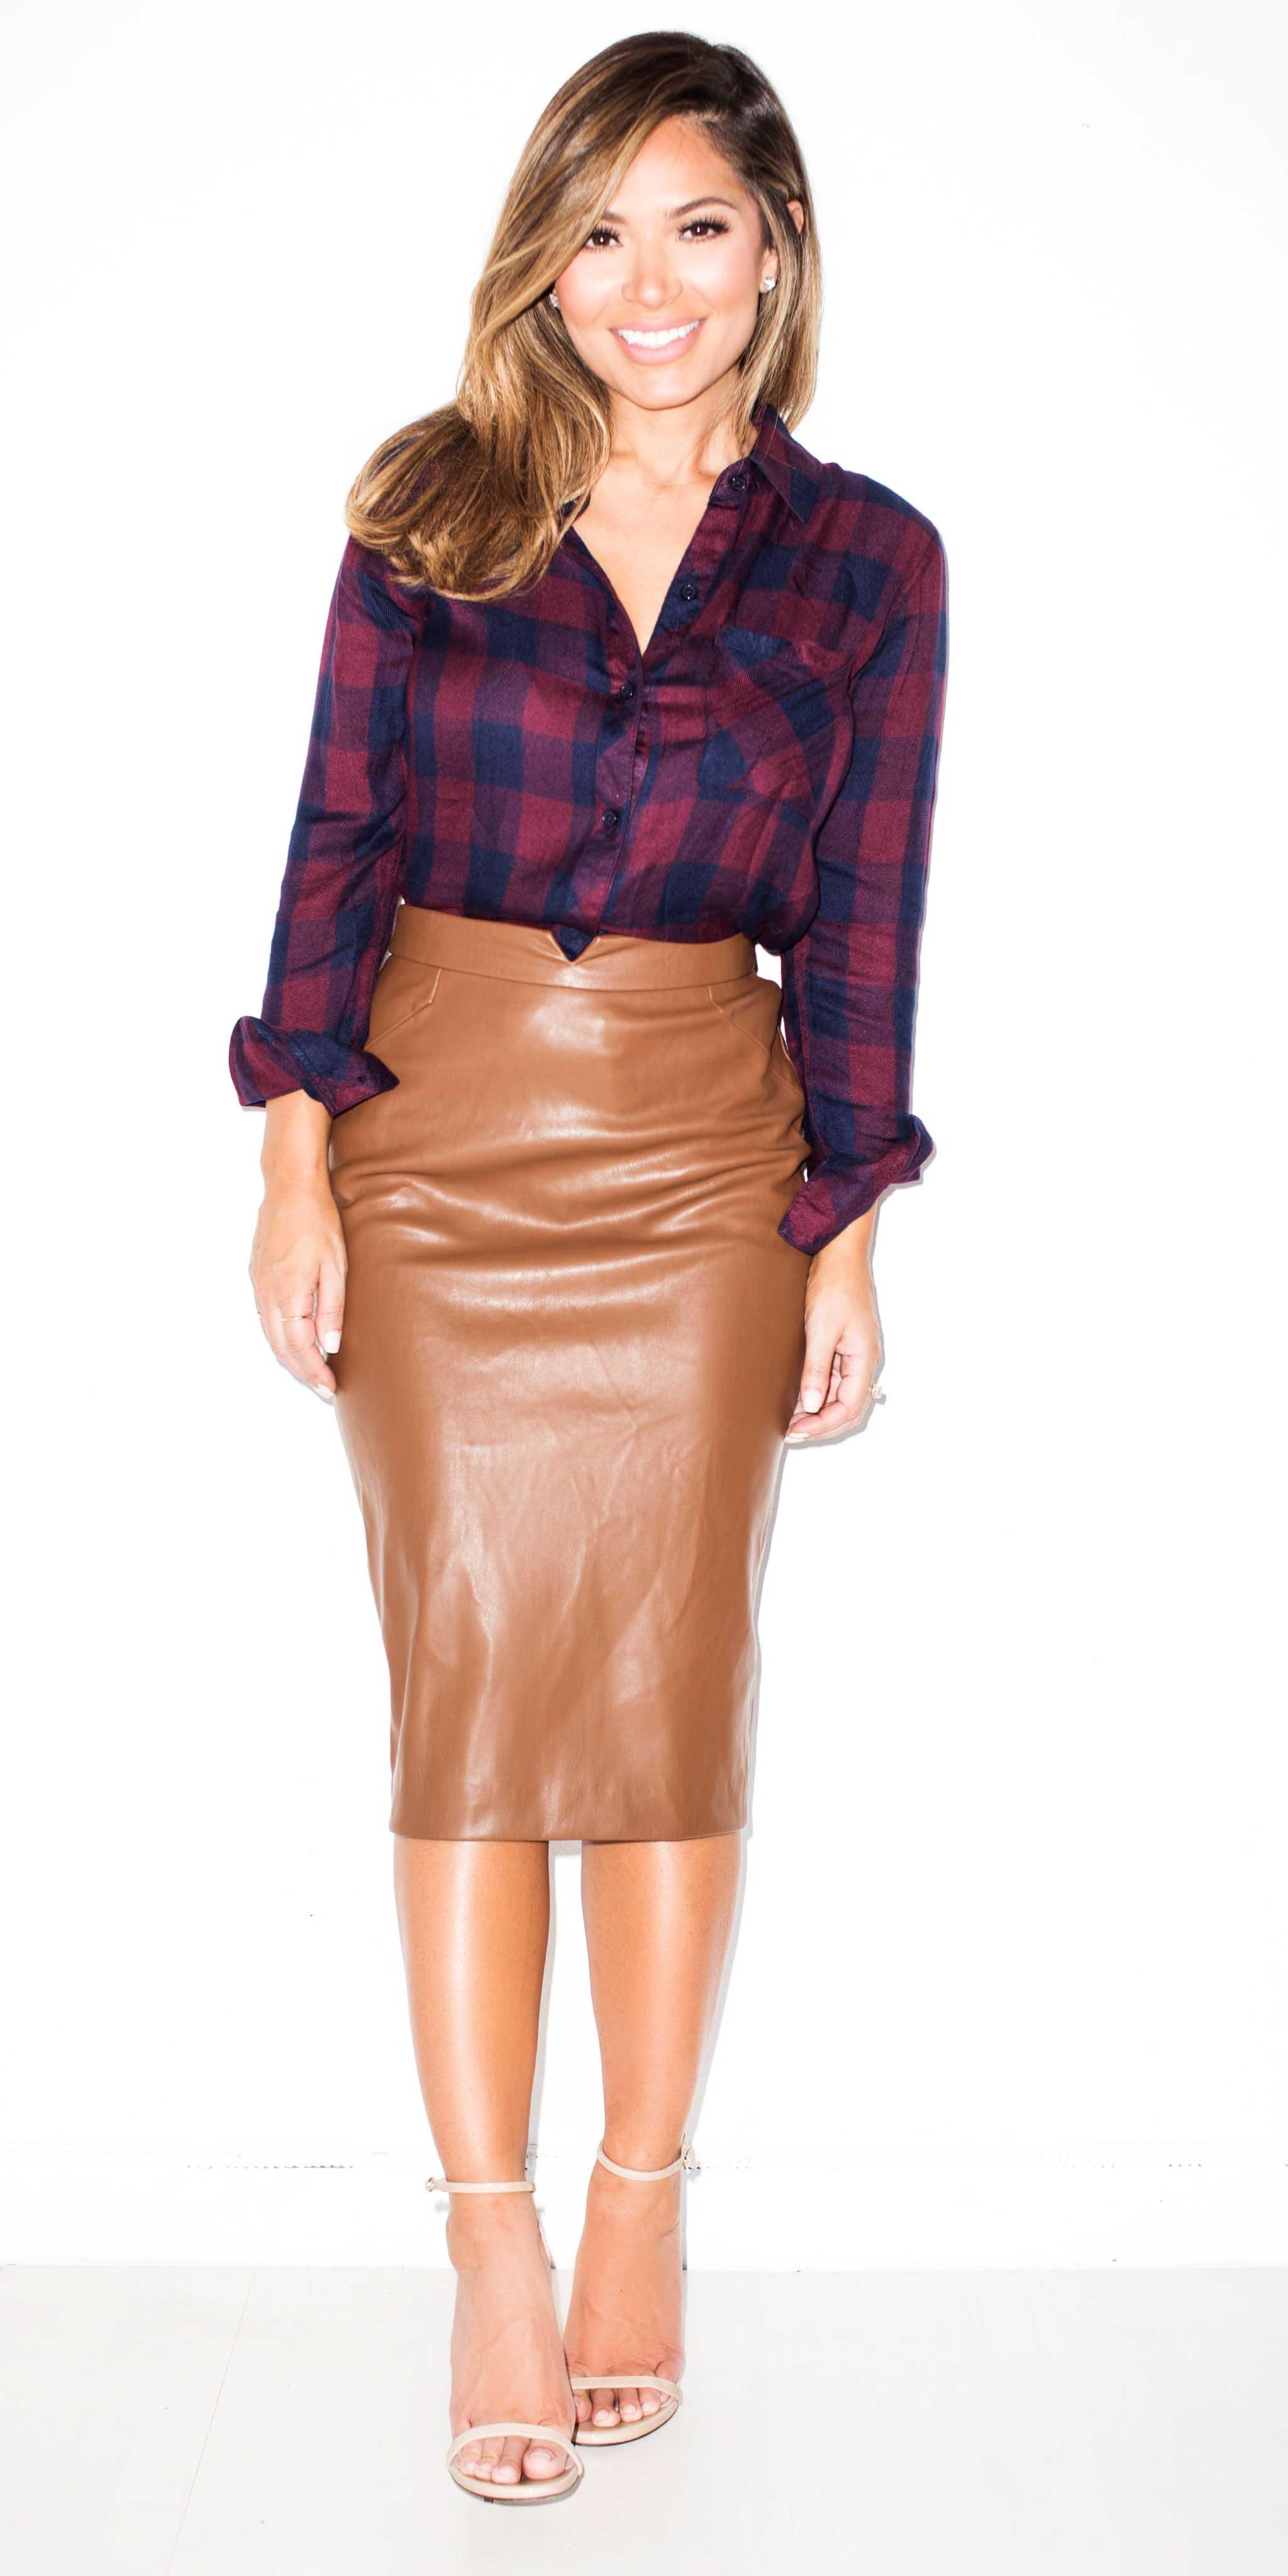 camel-pencil-skirt-leather-burgundy-plaid-shirt-fall-winter-hairr-lunch.jpg